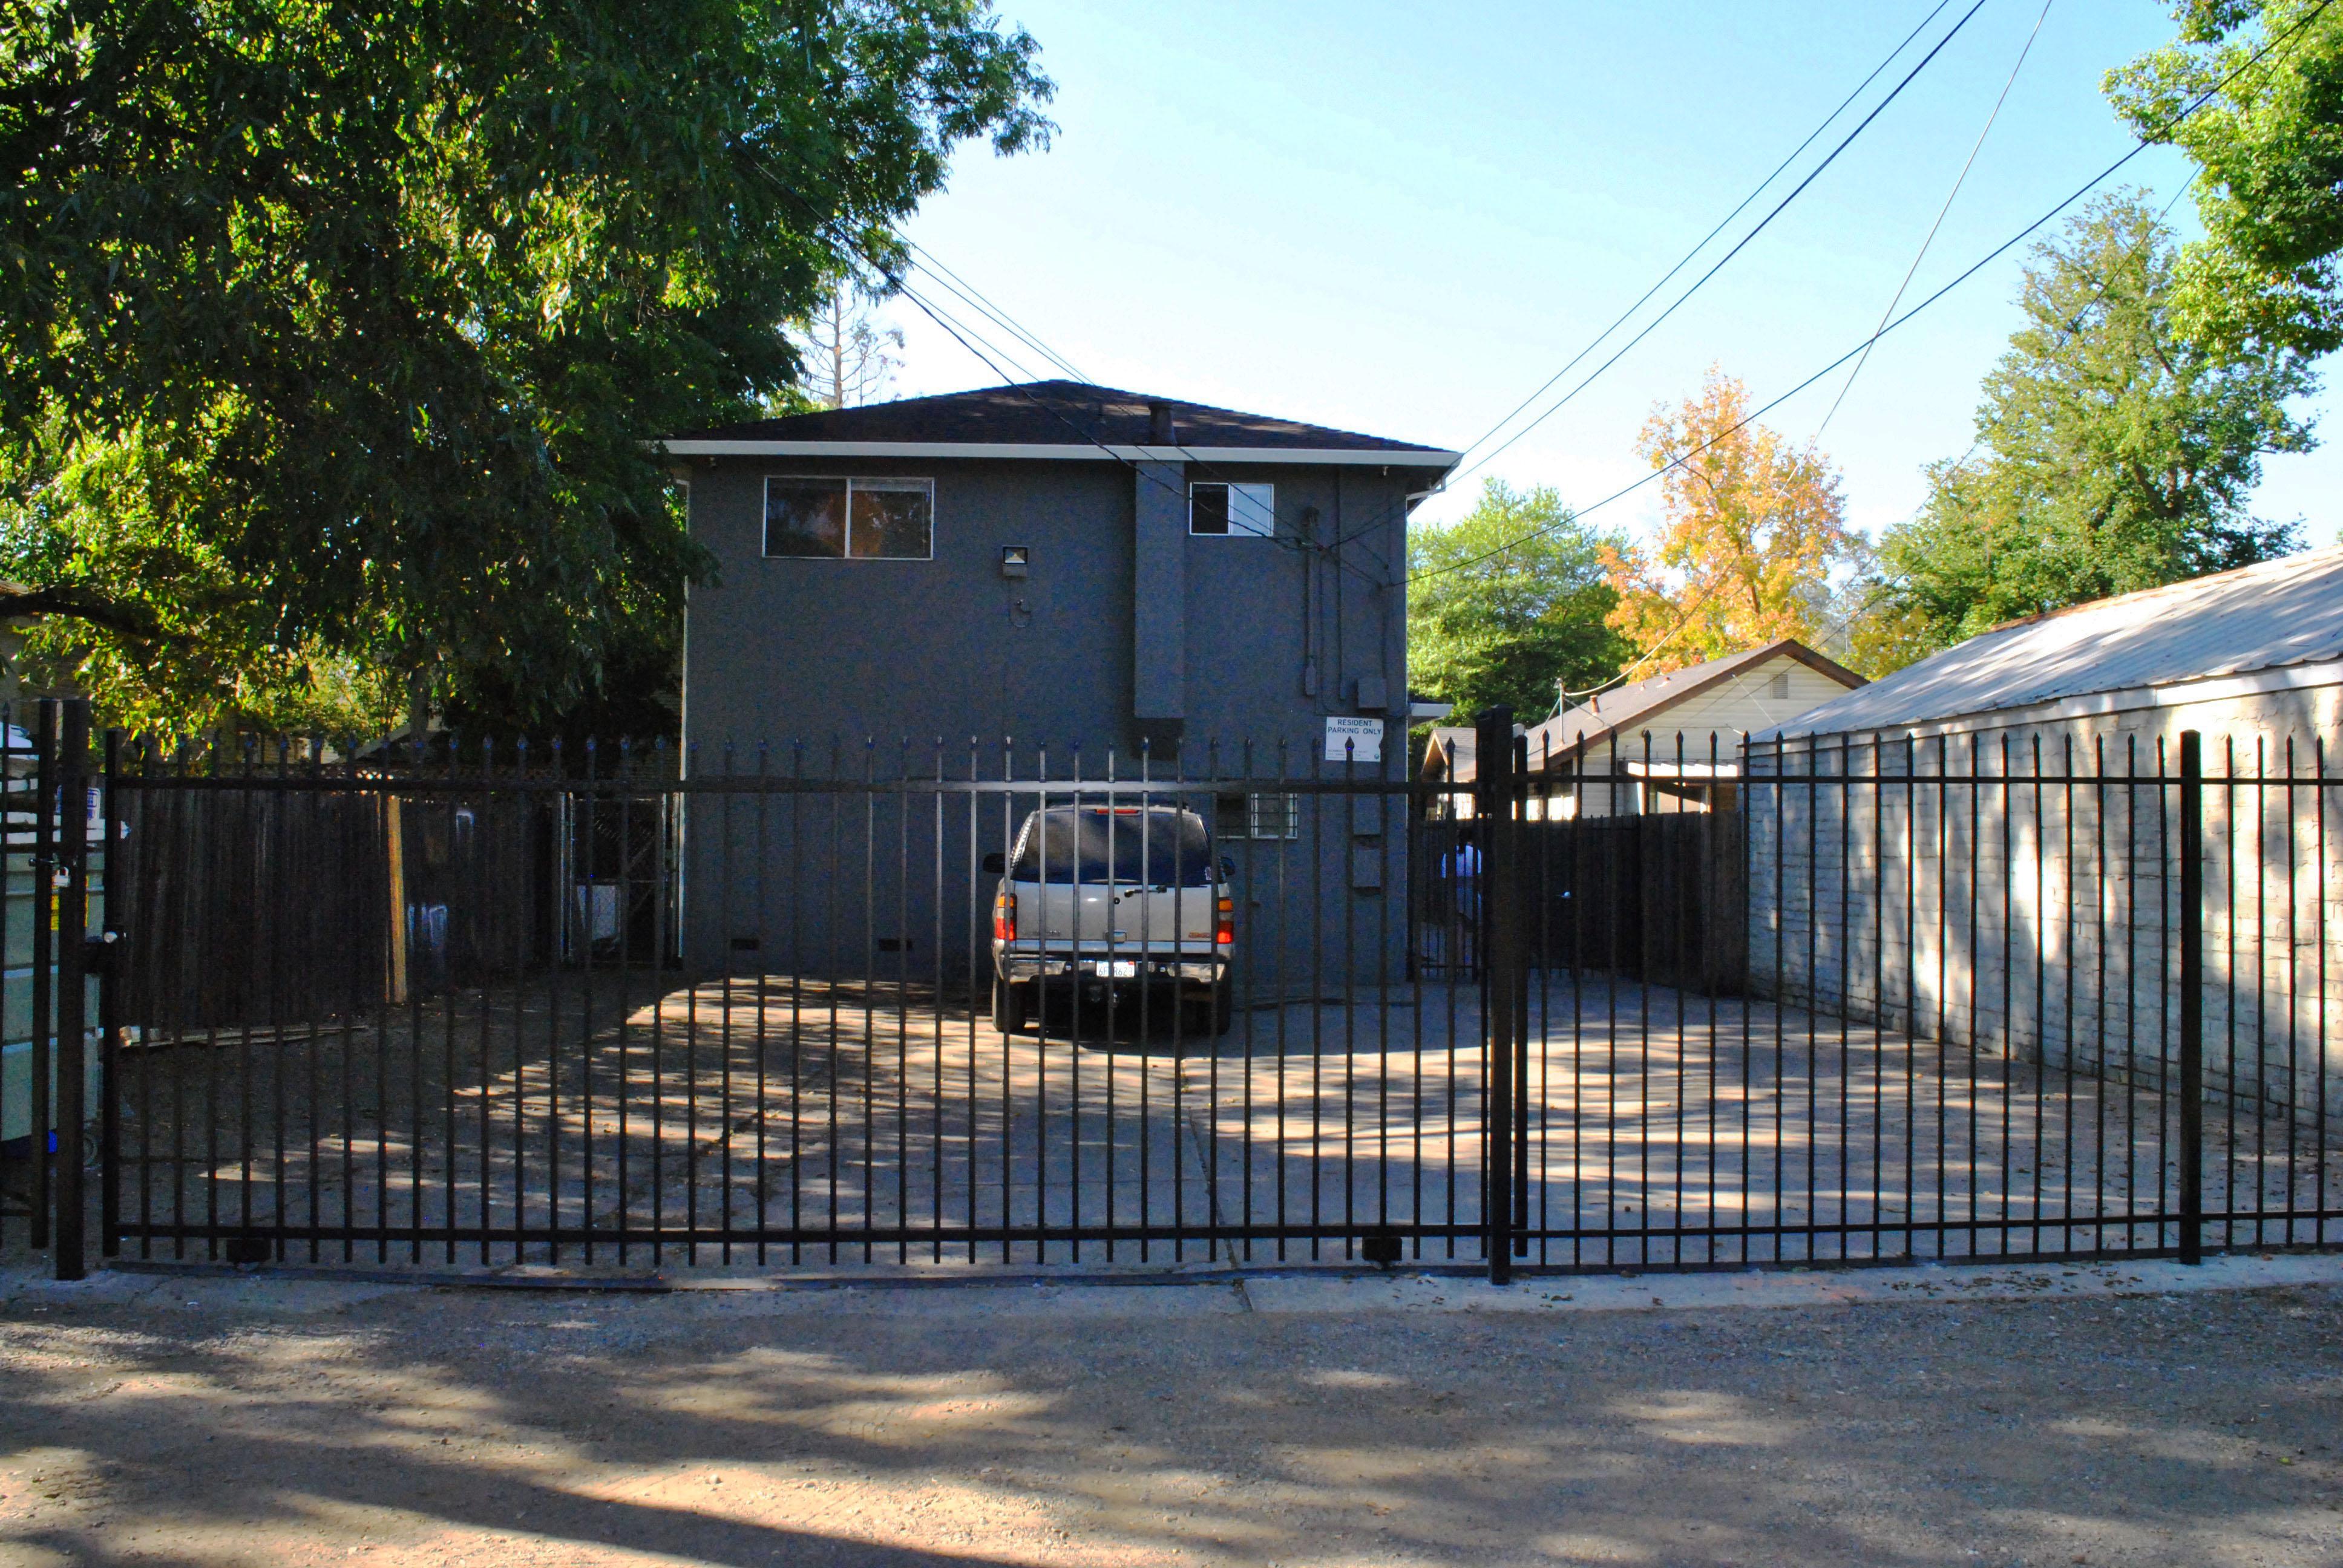 3643 1st Ave Apartment Building Perito Moreno Holdings Llc